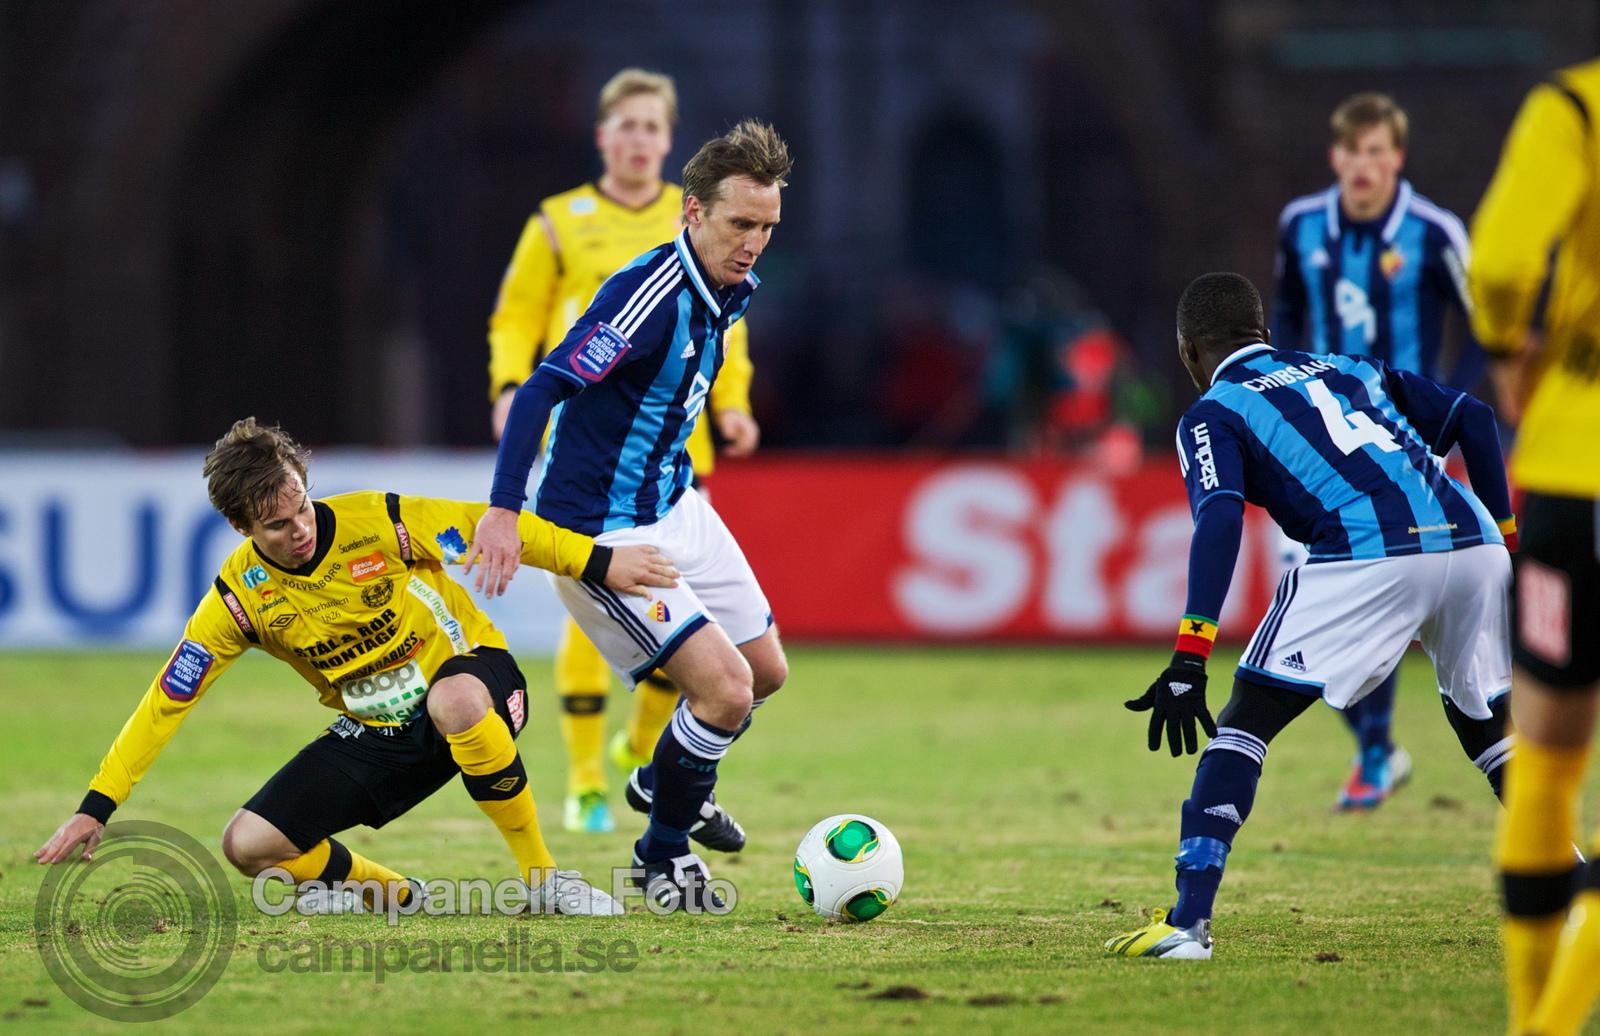 Djurgårdens IF vs Mjällby AIF - 4 of 10